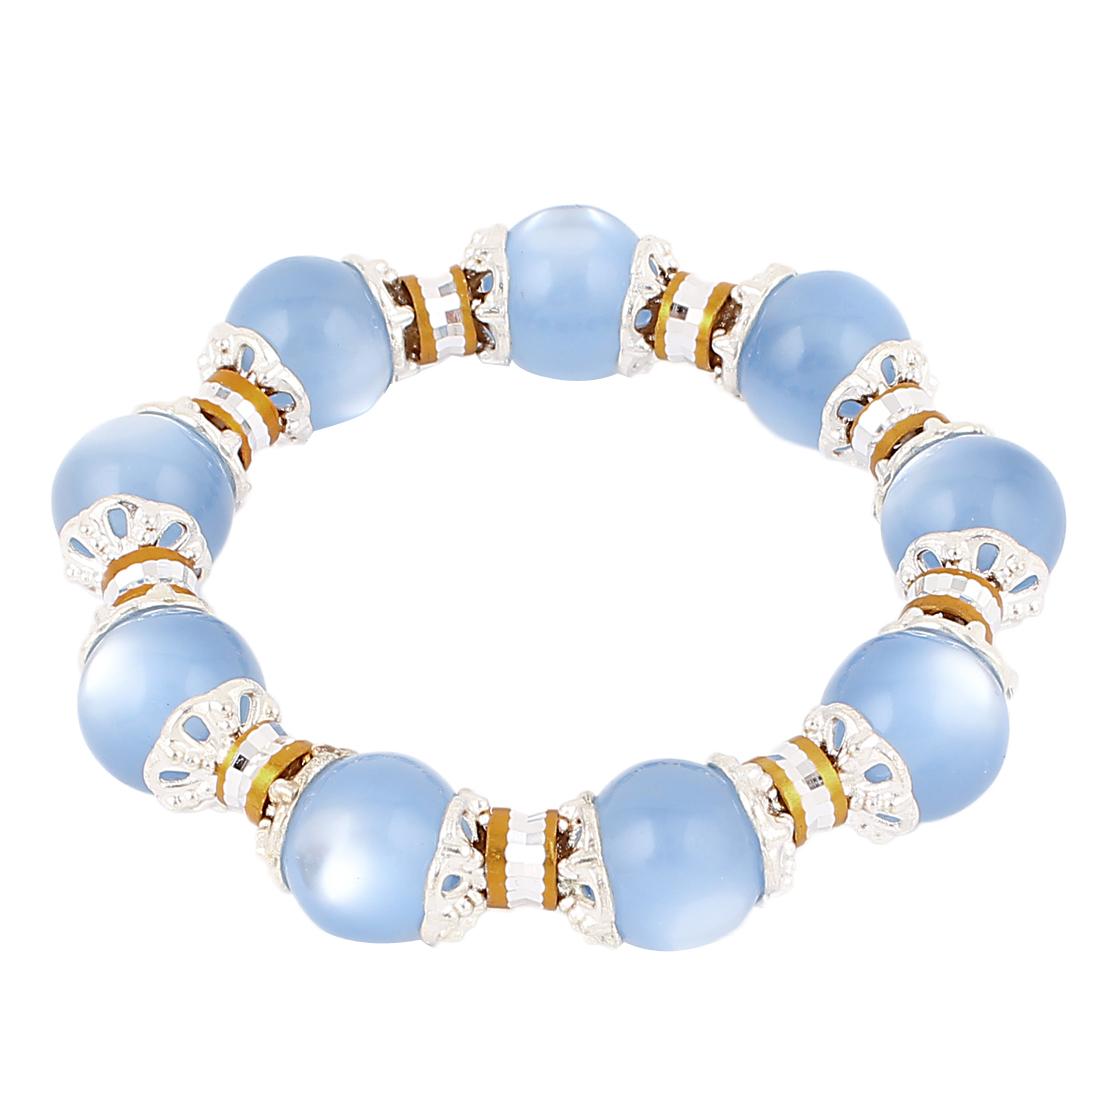 Women Imitation Pearls Beads Decor Elastic Wrist Bangle Bracelet Blue